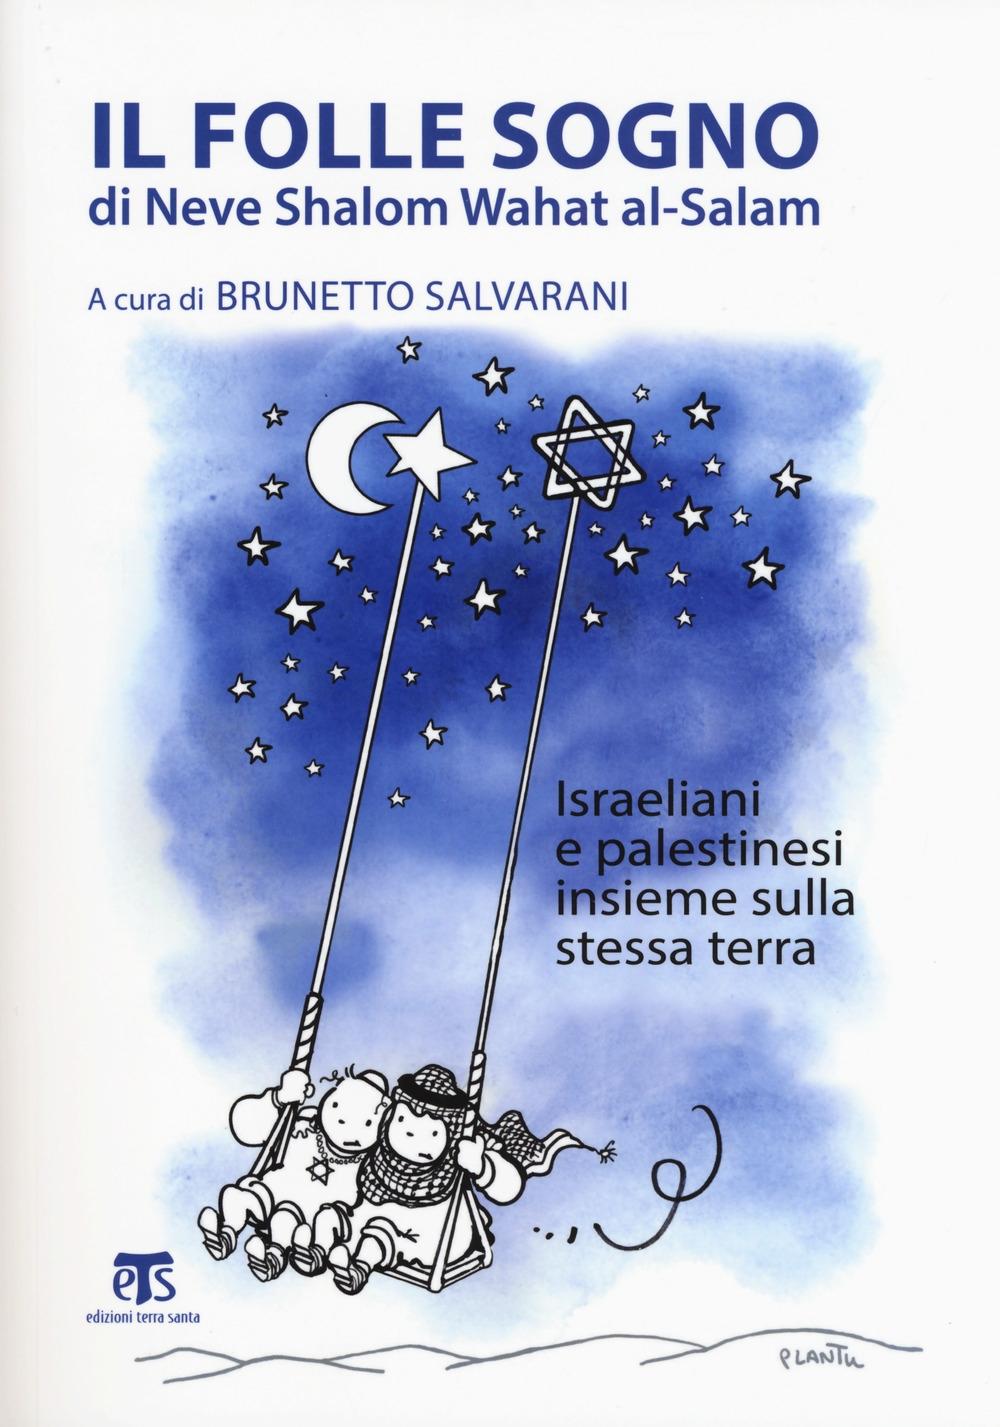 Il folle sogno di Neve Shalom Wahat al-Salam. Israeliani e palestinesi insieme sulla stessa terra